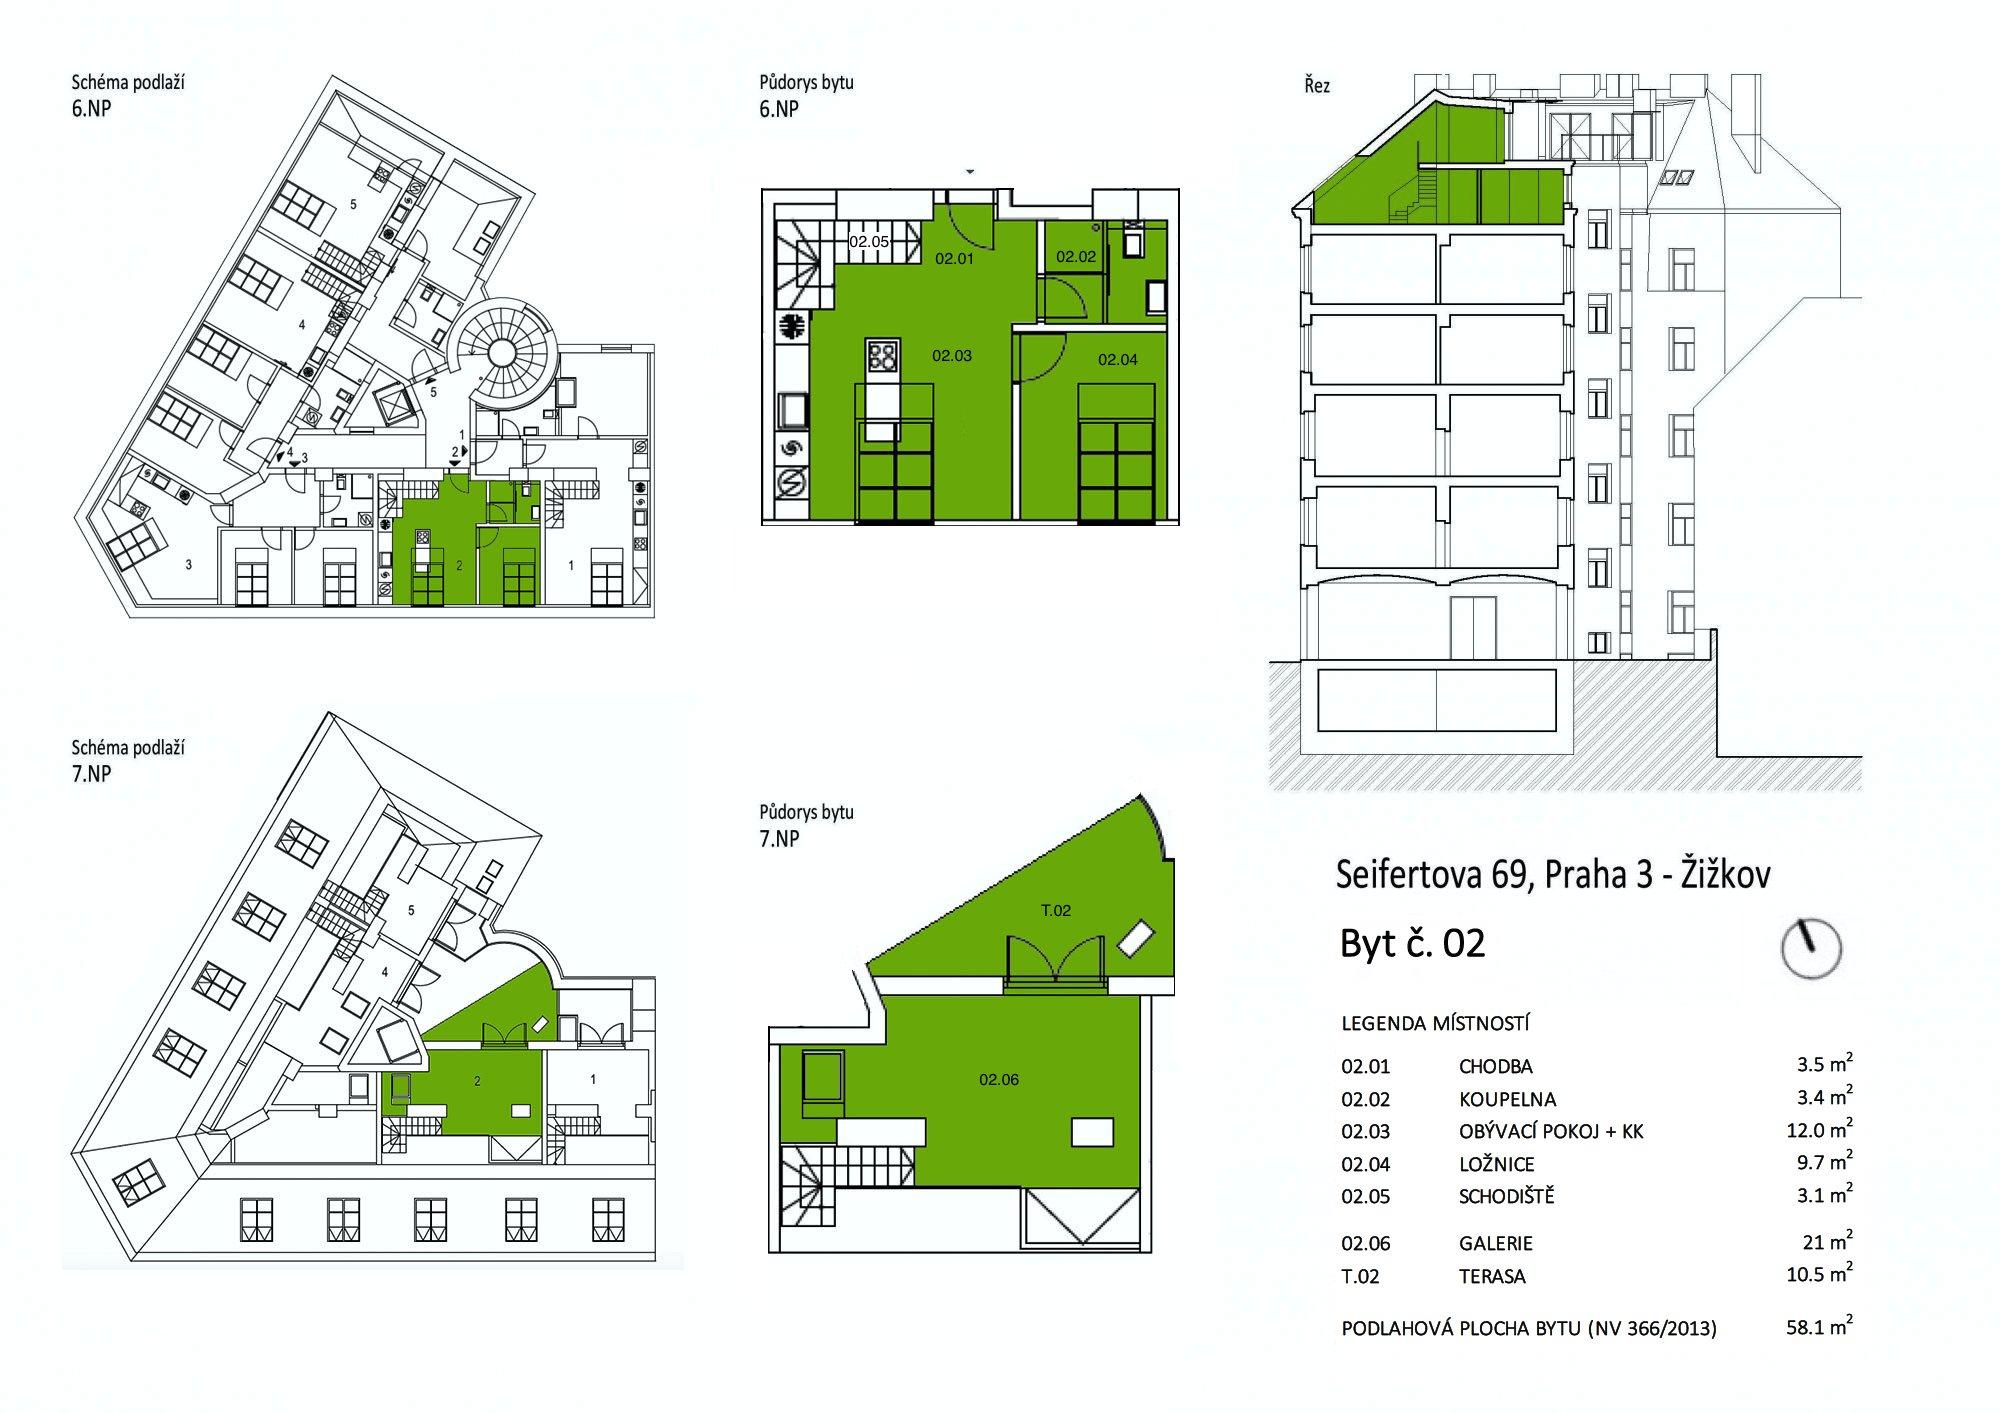 Půdorys - Půdní byt 2+kk, plocha 69 m², ulice Seifertova, Praha 3 - Žižkov